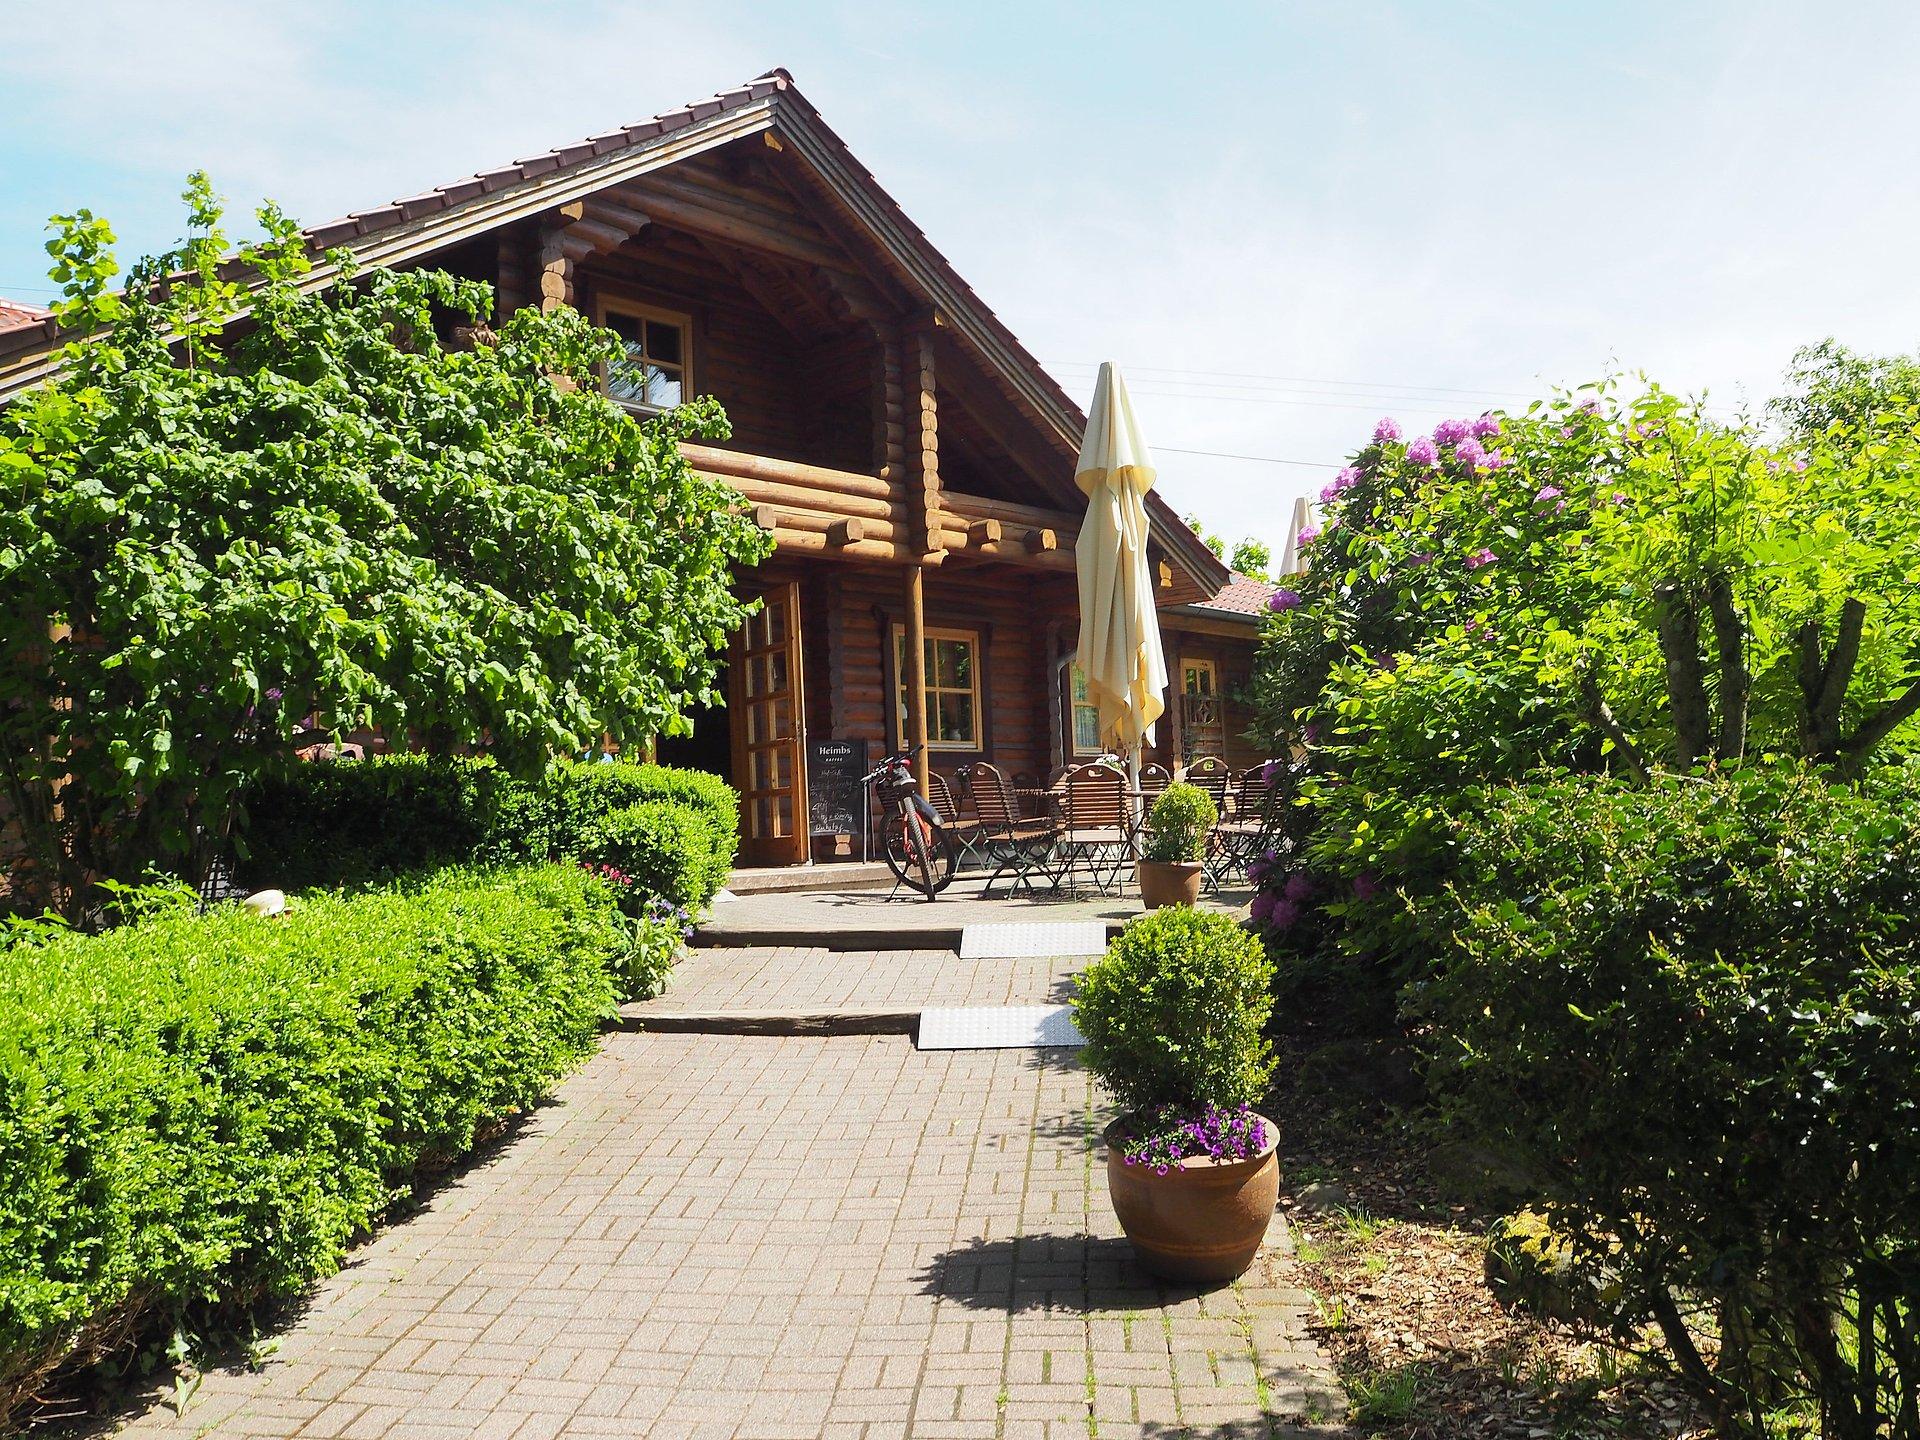 Dapprich farmyard café in Seck, Westerwald